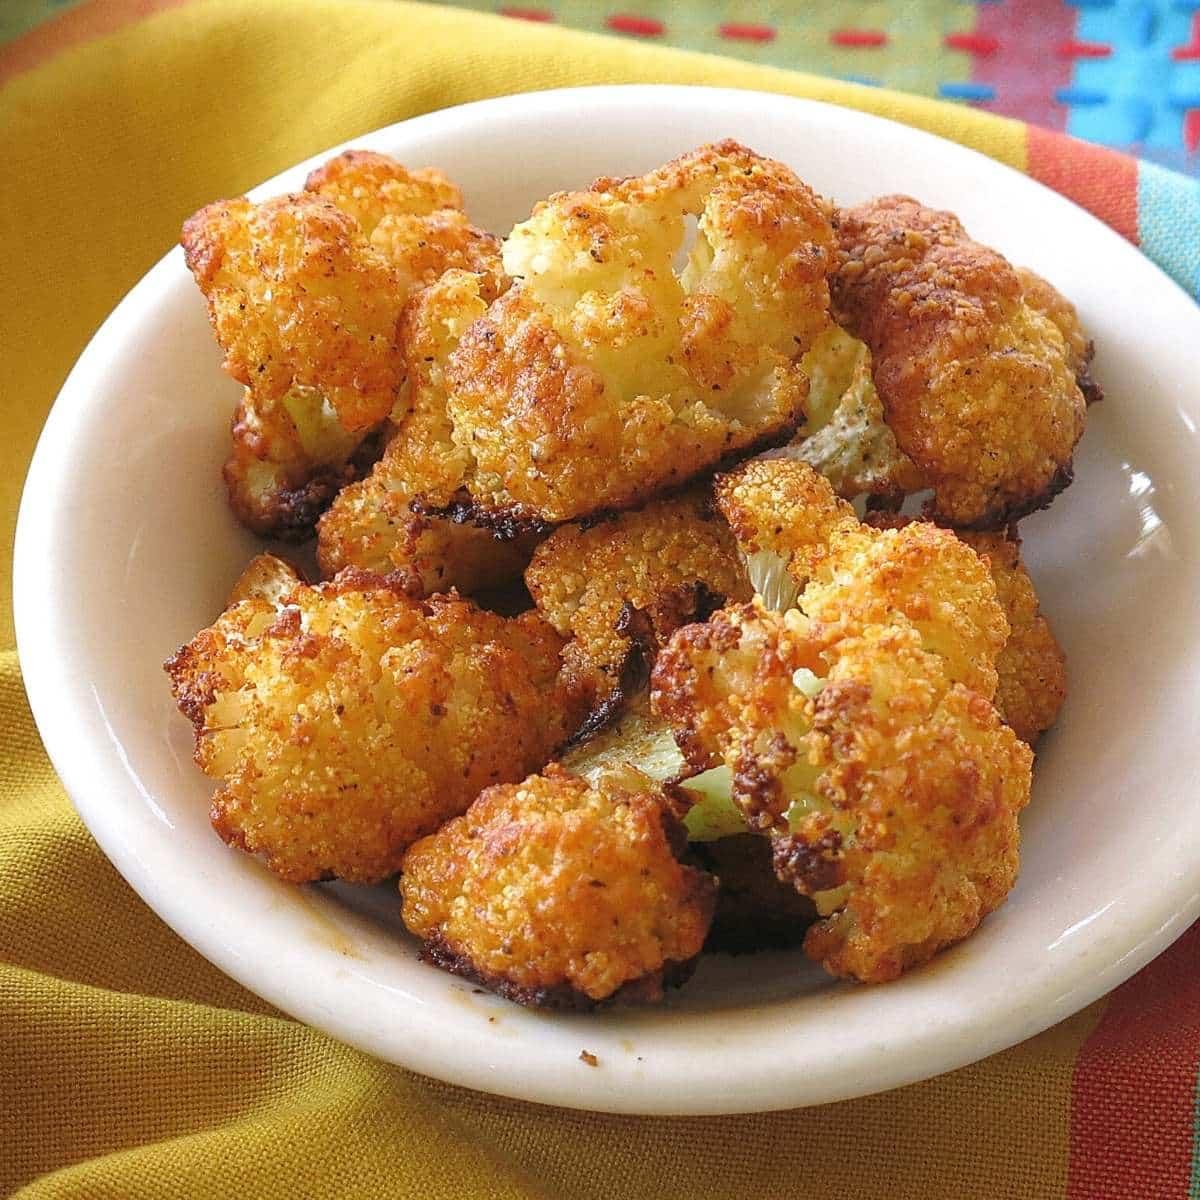 Parmesan Cauliflower Bites Appetizer in a bowl.